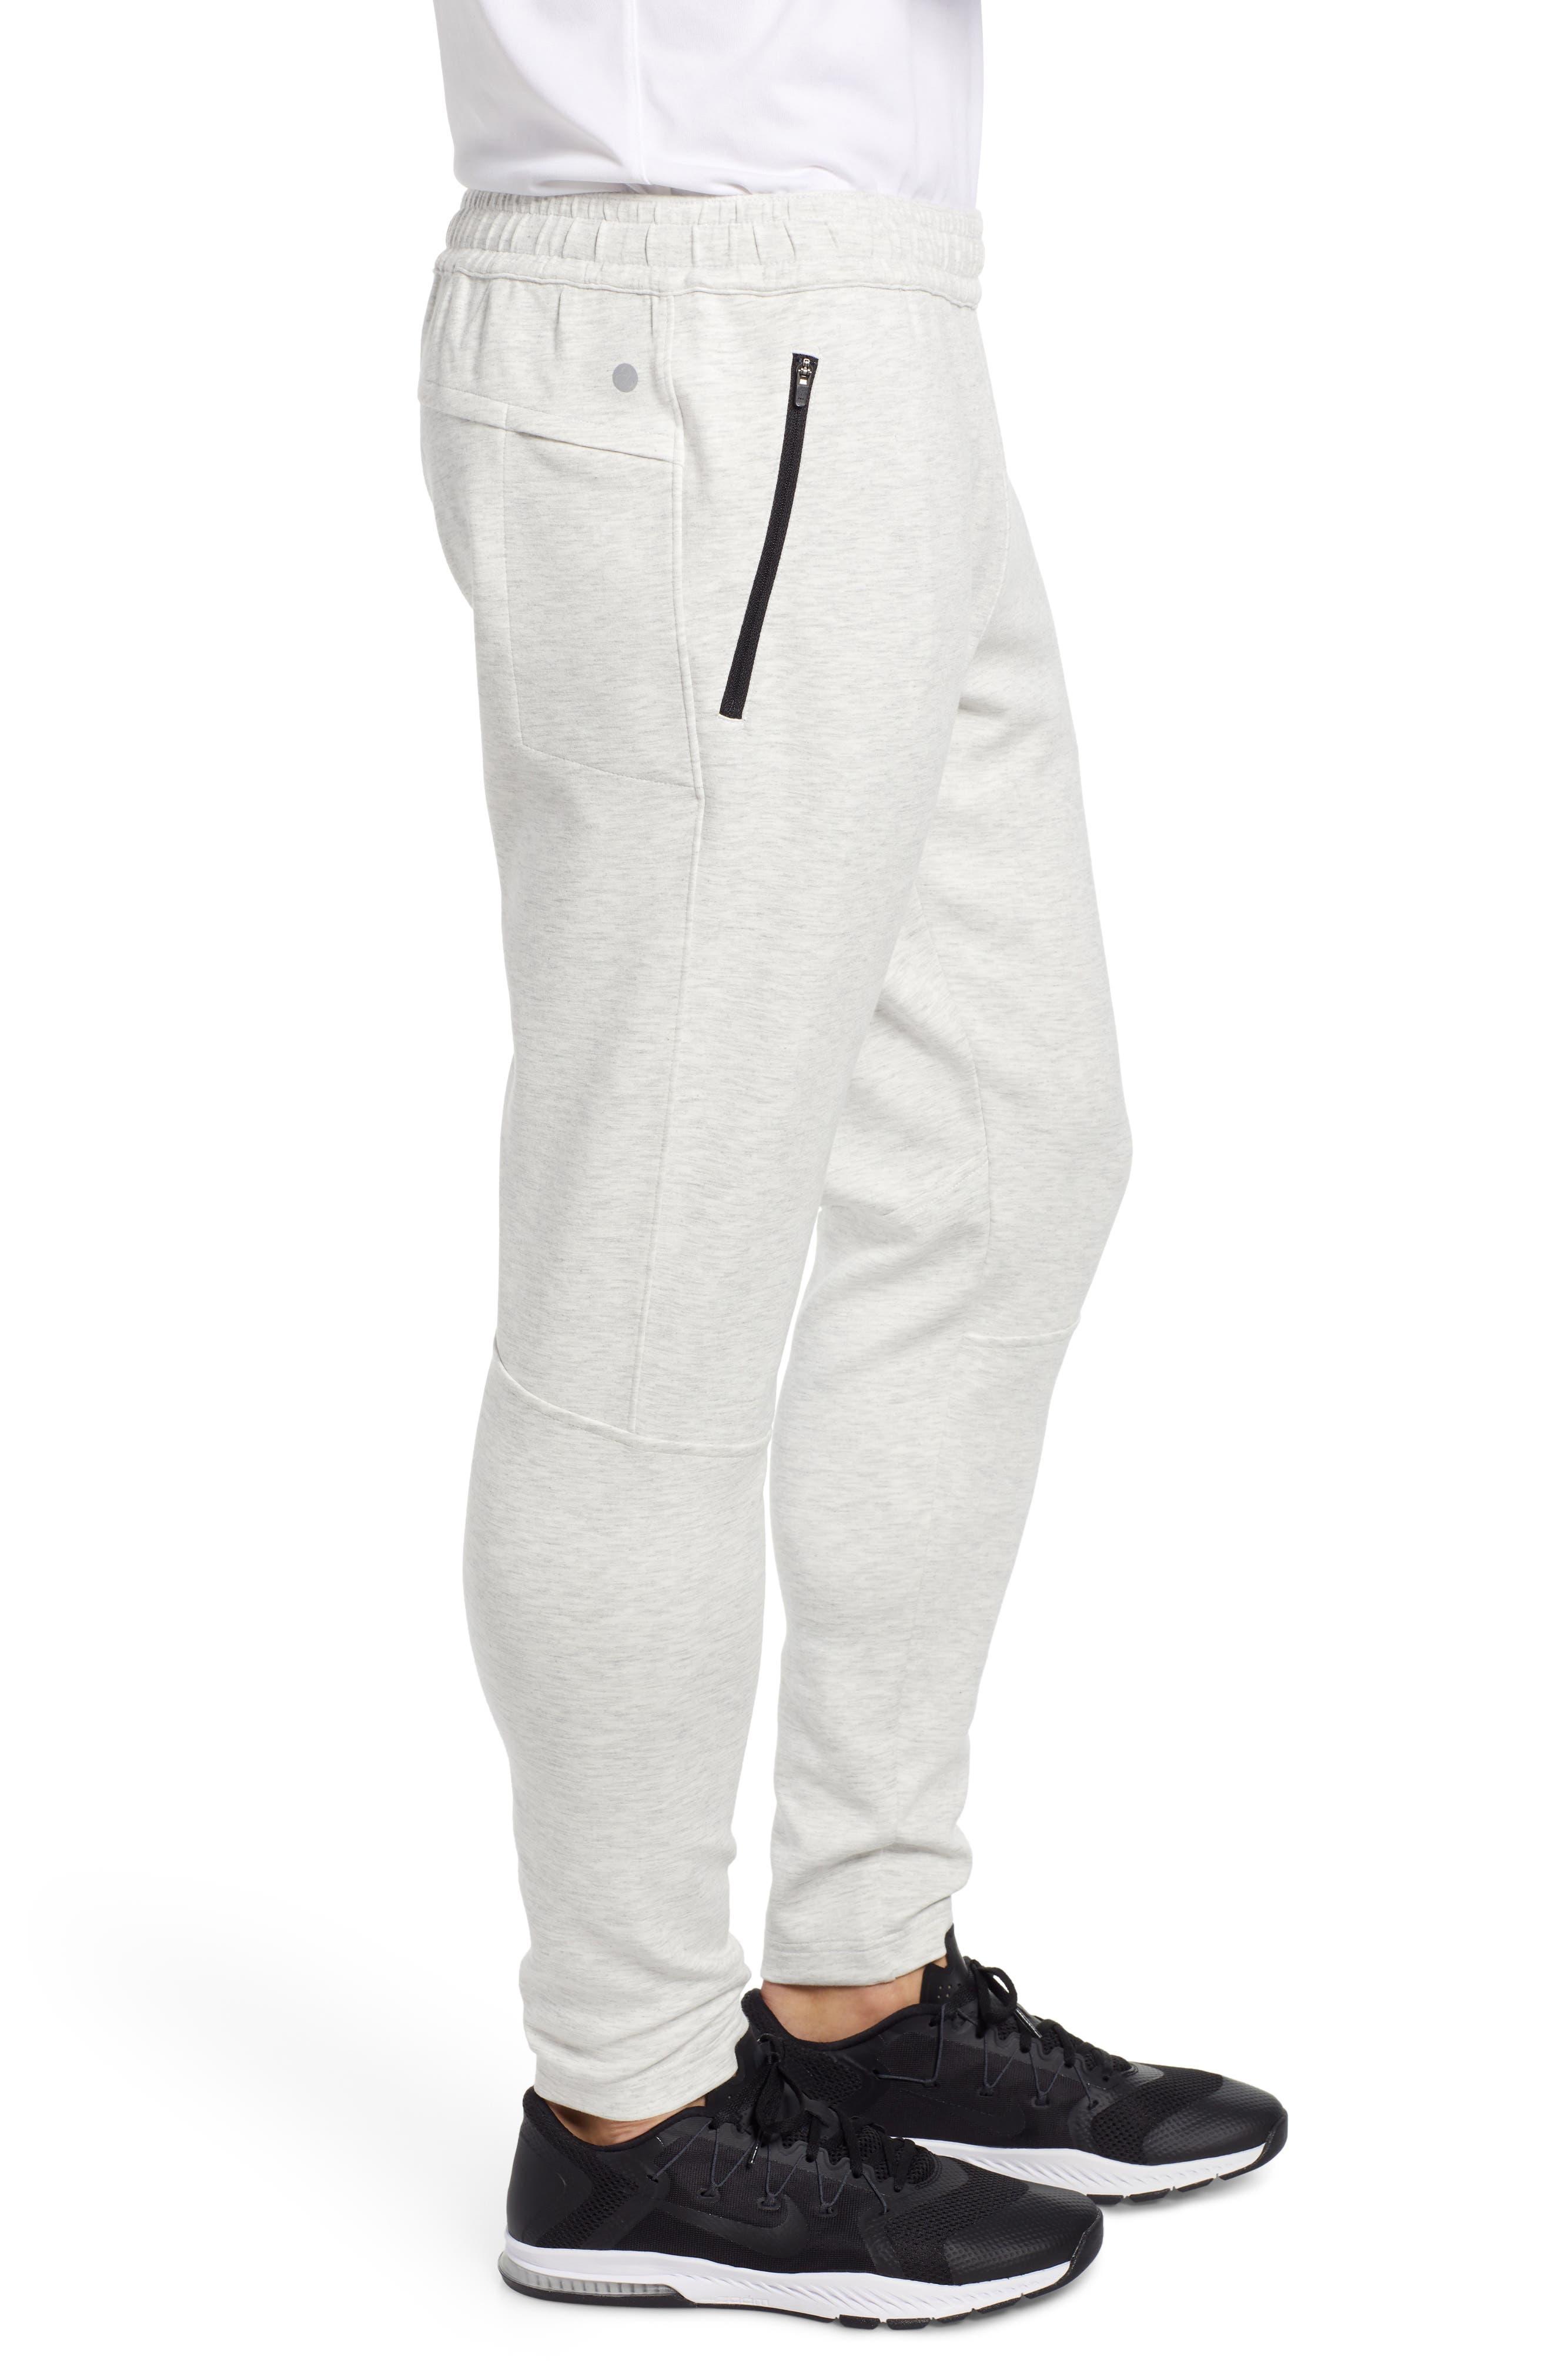 ZELLA, Zip Pocket Tech Jogger Pants, Alternate thumbnail 4, color, WHITE OXIDE MELANGE